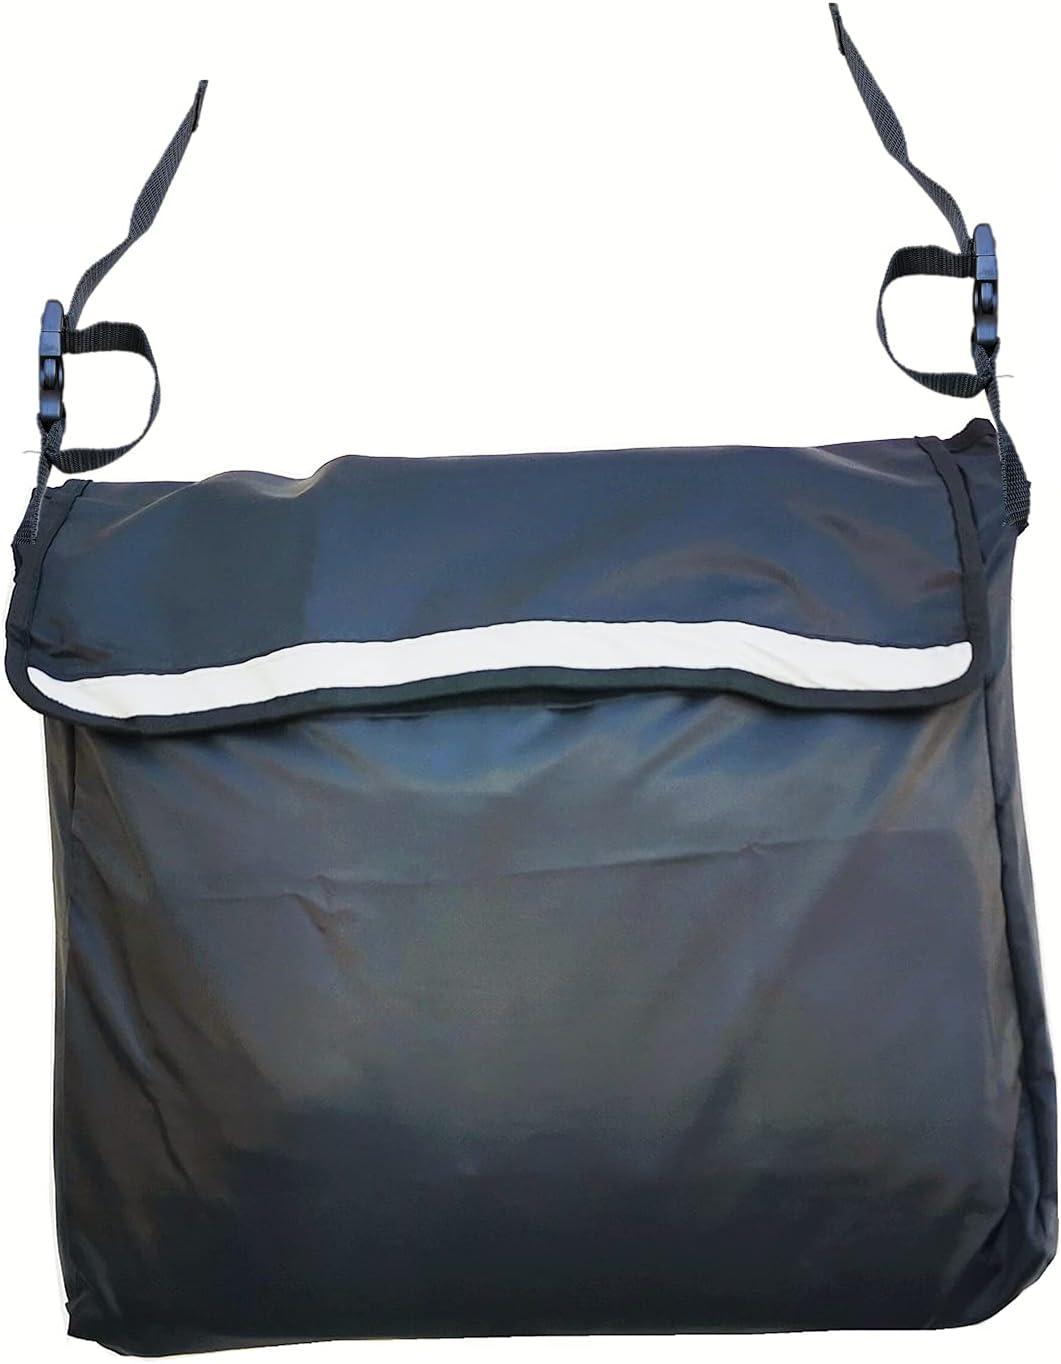 KOCKABC Wheelchair New Free Shipping Backpack Bag Machine Washable Bac Very popular